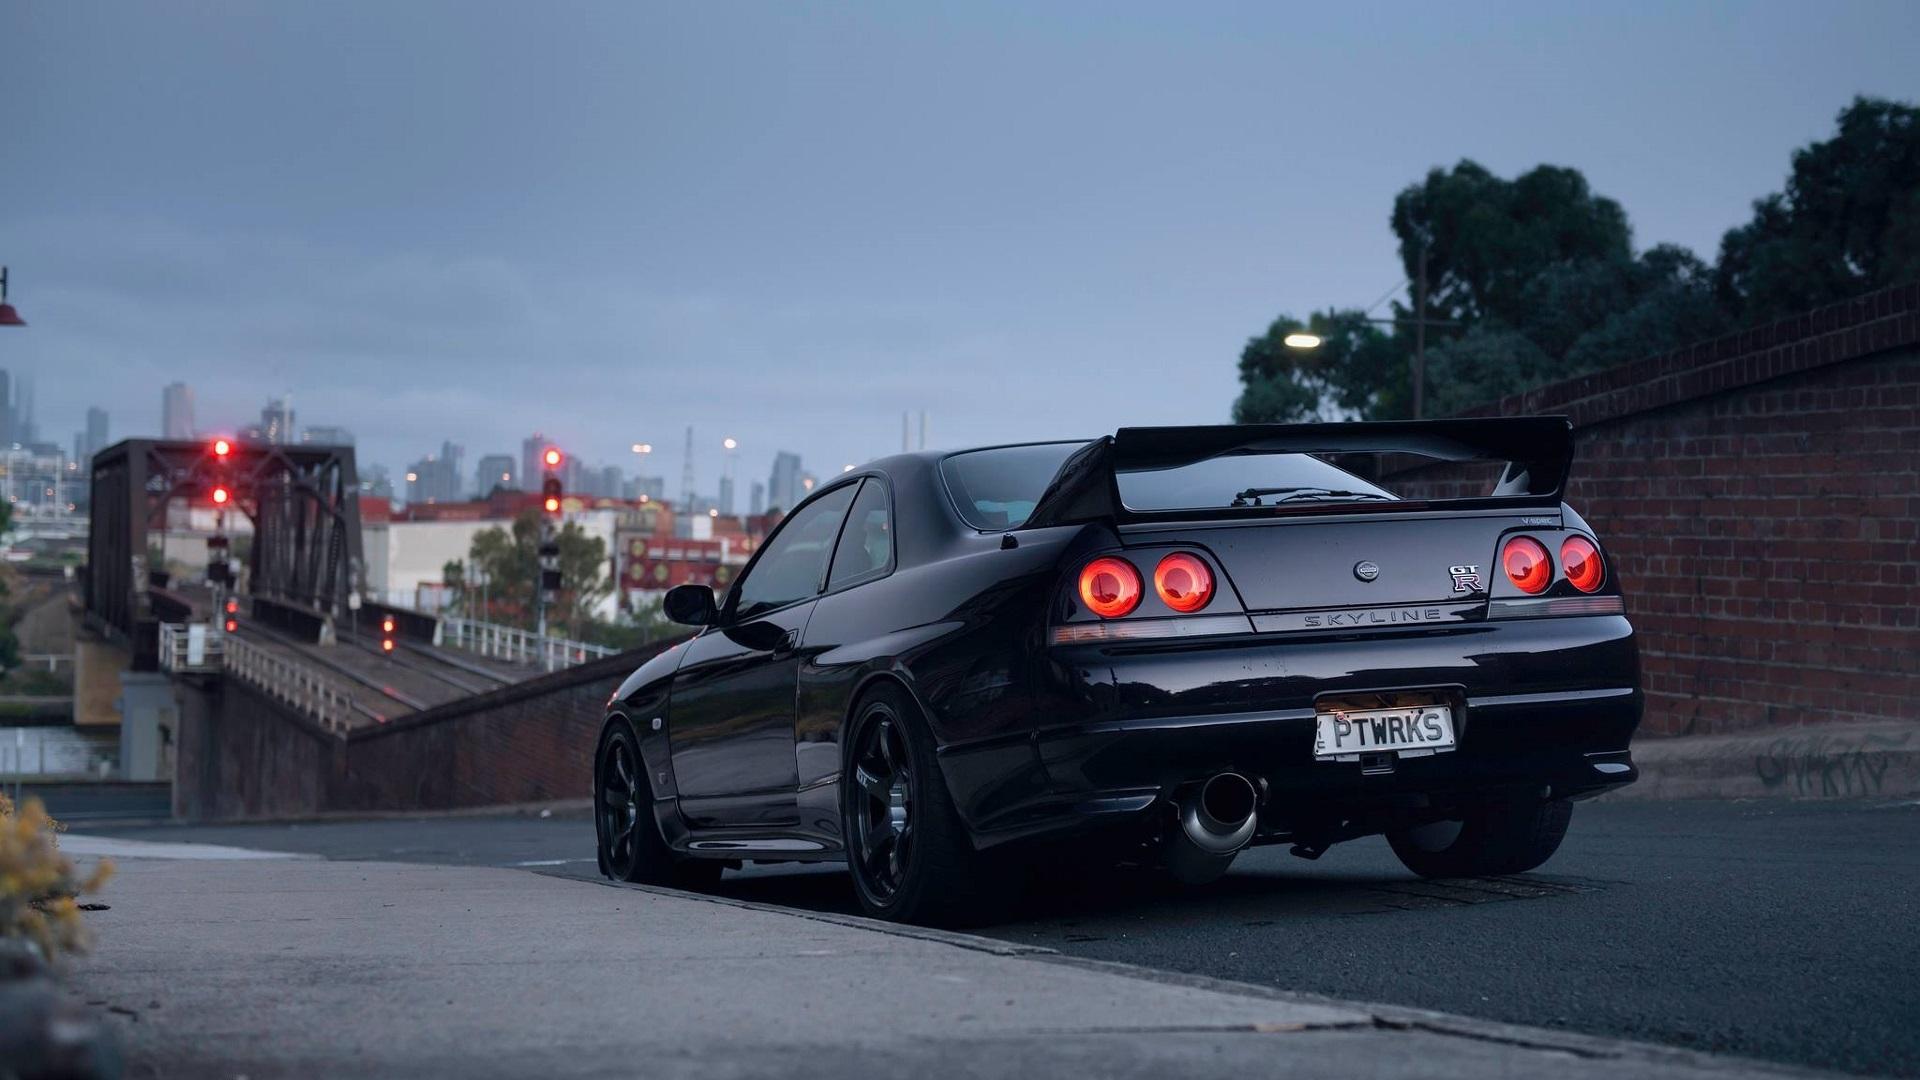 Nissan Skyline GT-R R33, Nissan Skyline GT-R, Nissan ...